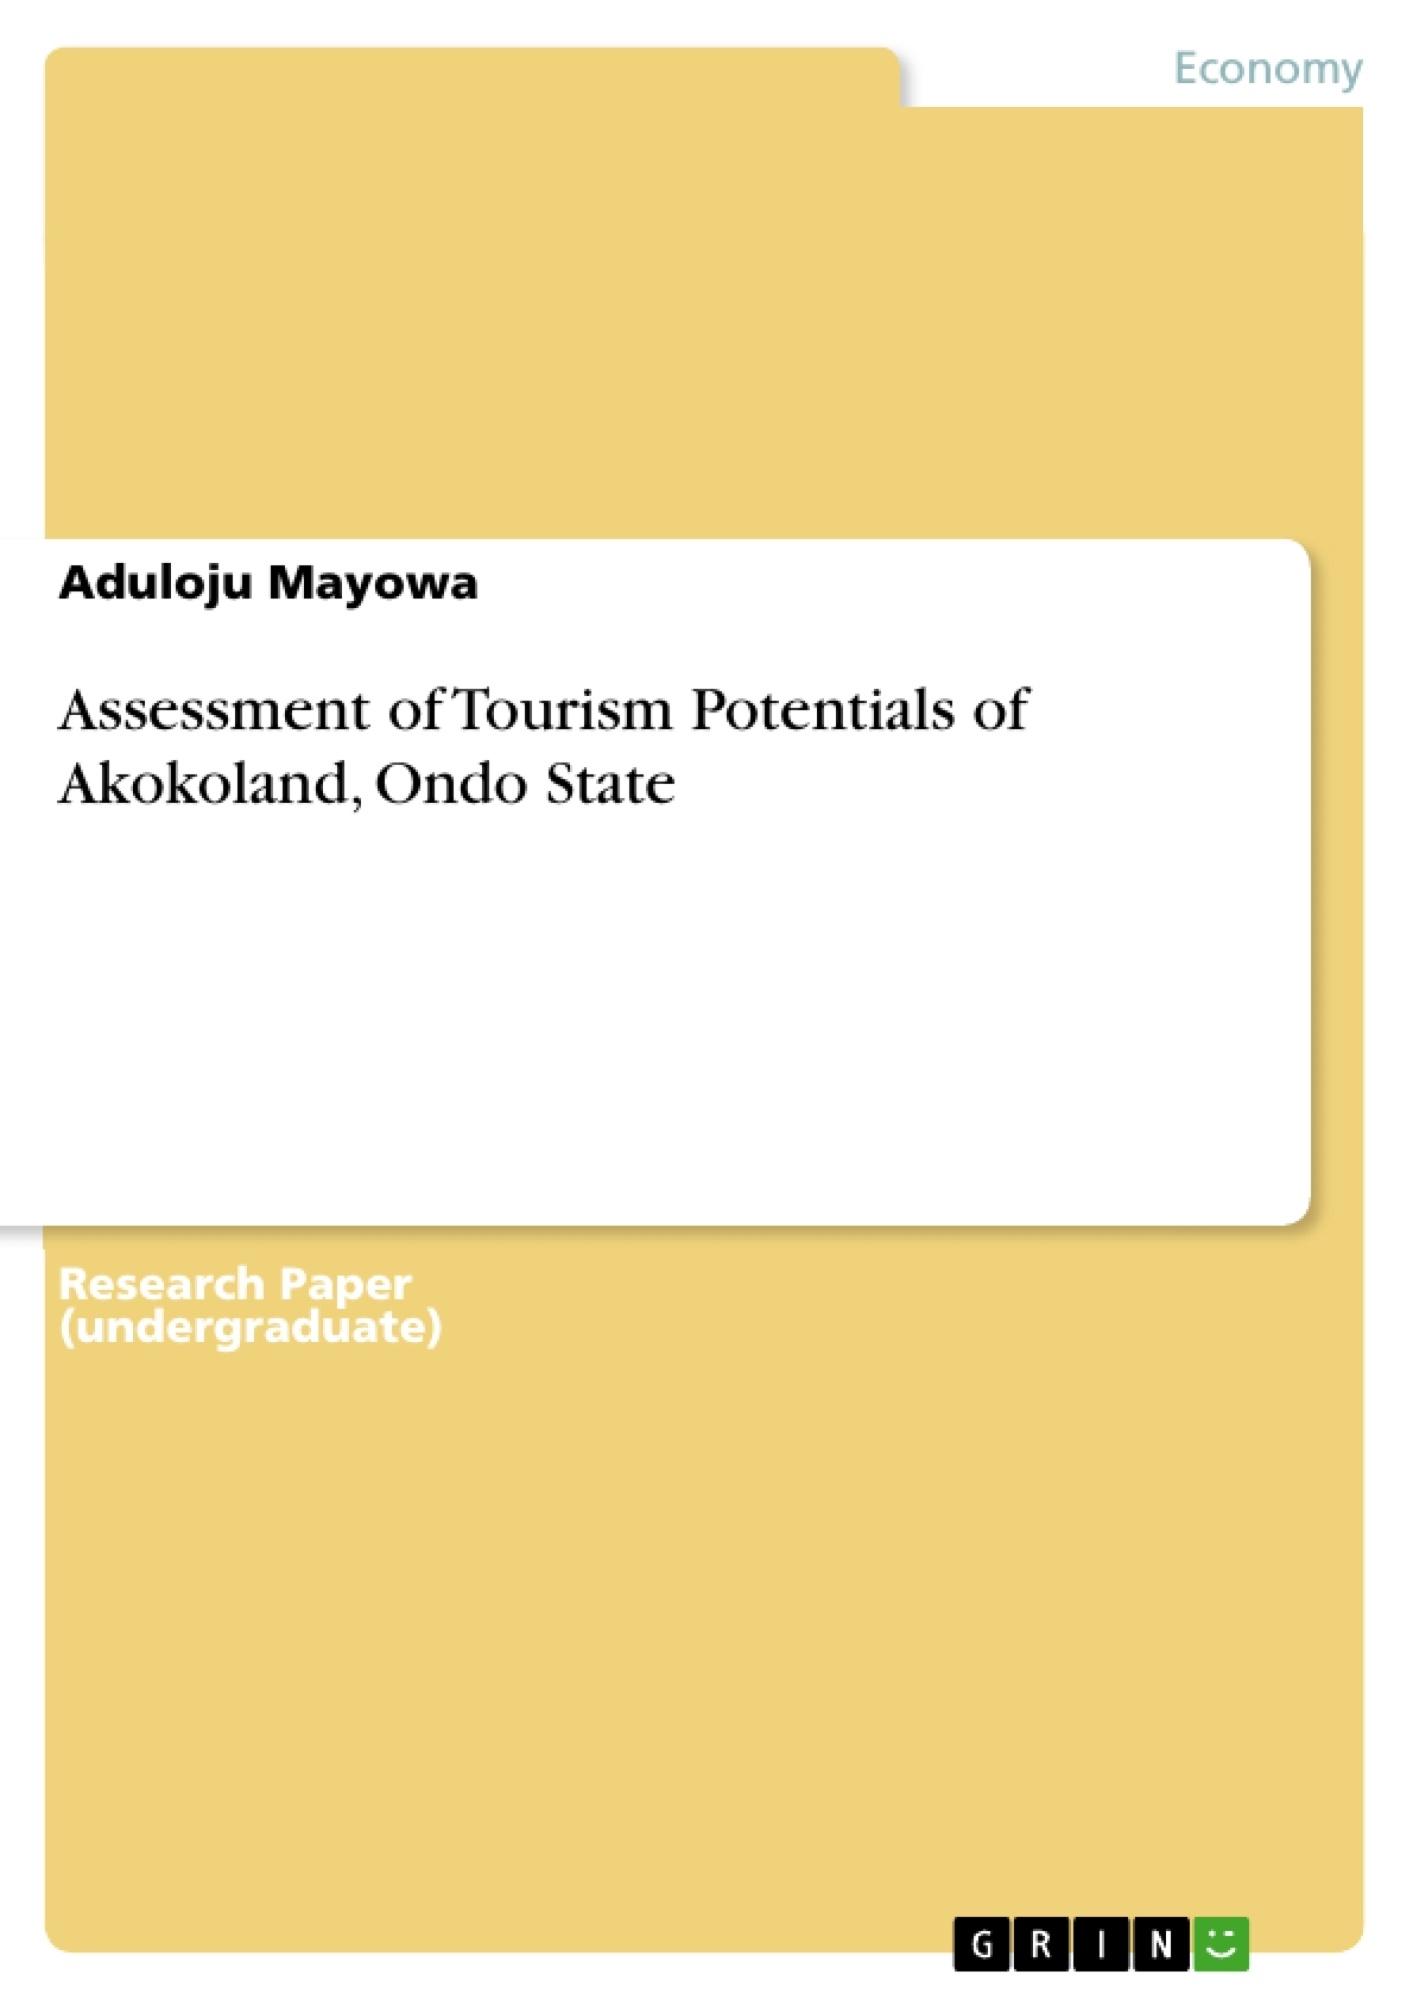 Title: Assessment of Tourism Potentials of Akokoland, Ondo State